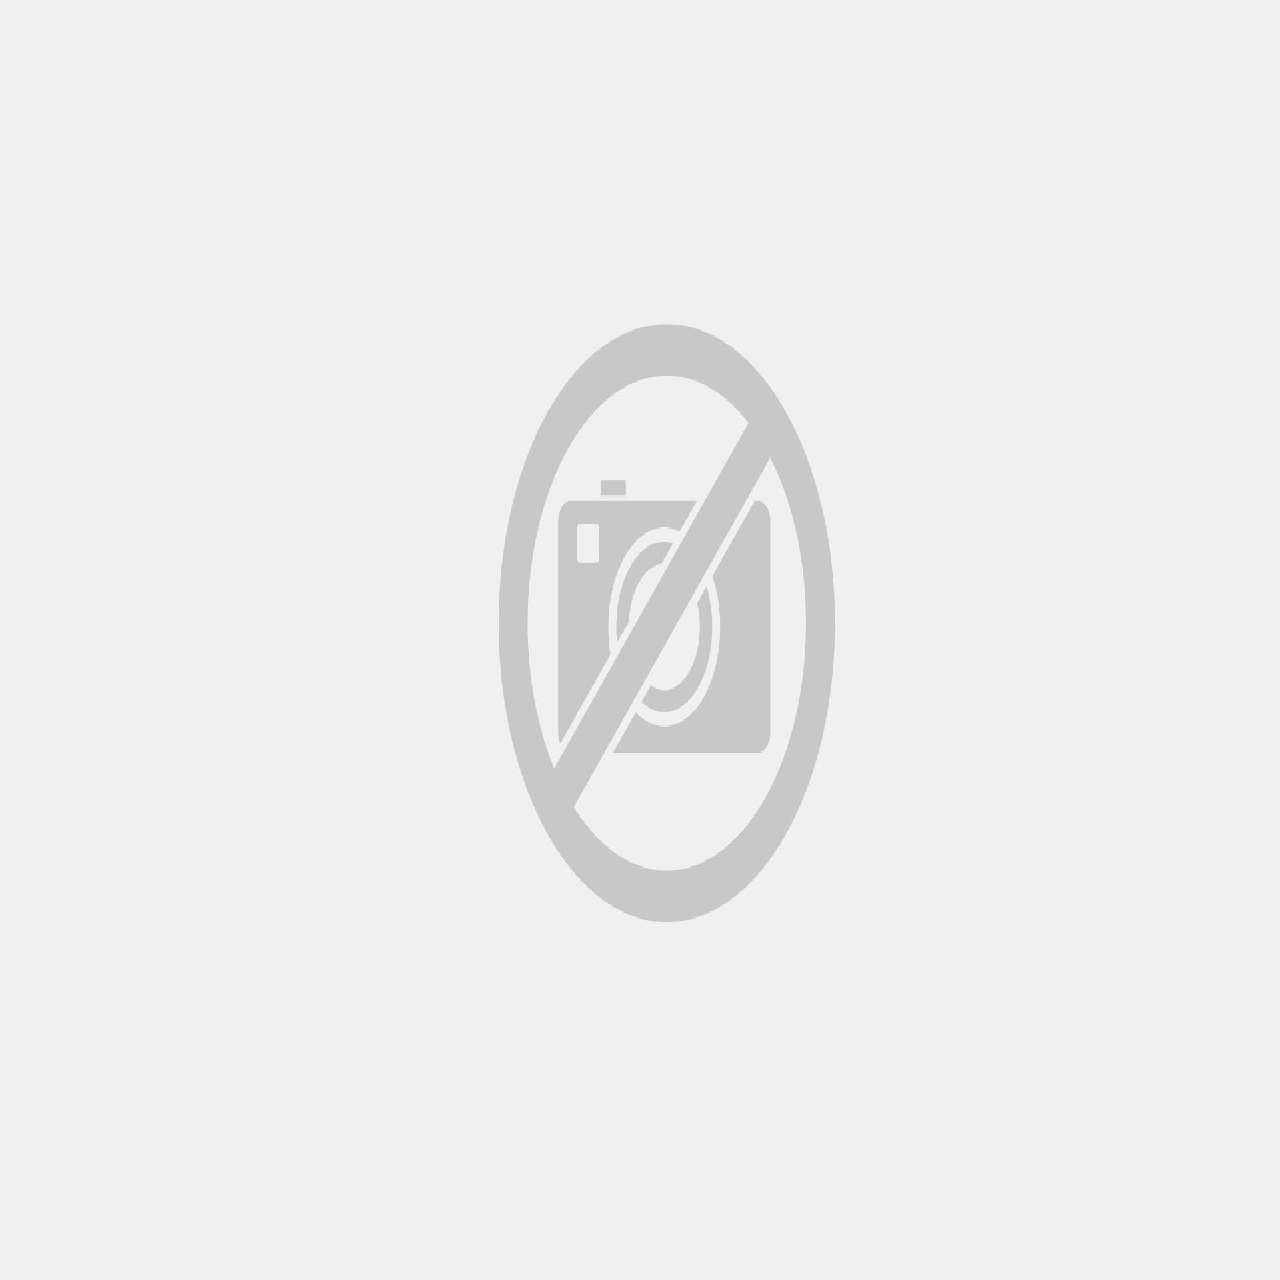 Hotel Alam Bidadari Seminyak Villas 3 Hrs Star Hotel In Seminyak Bali